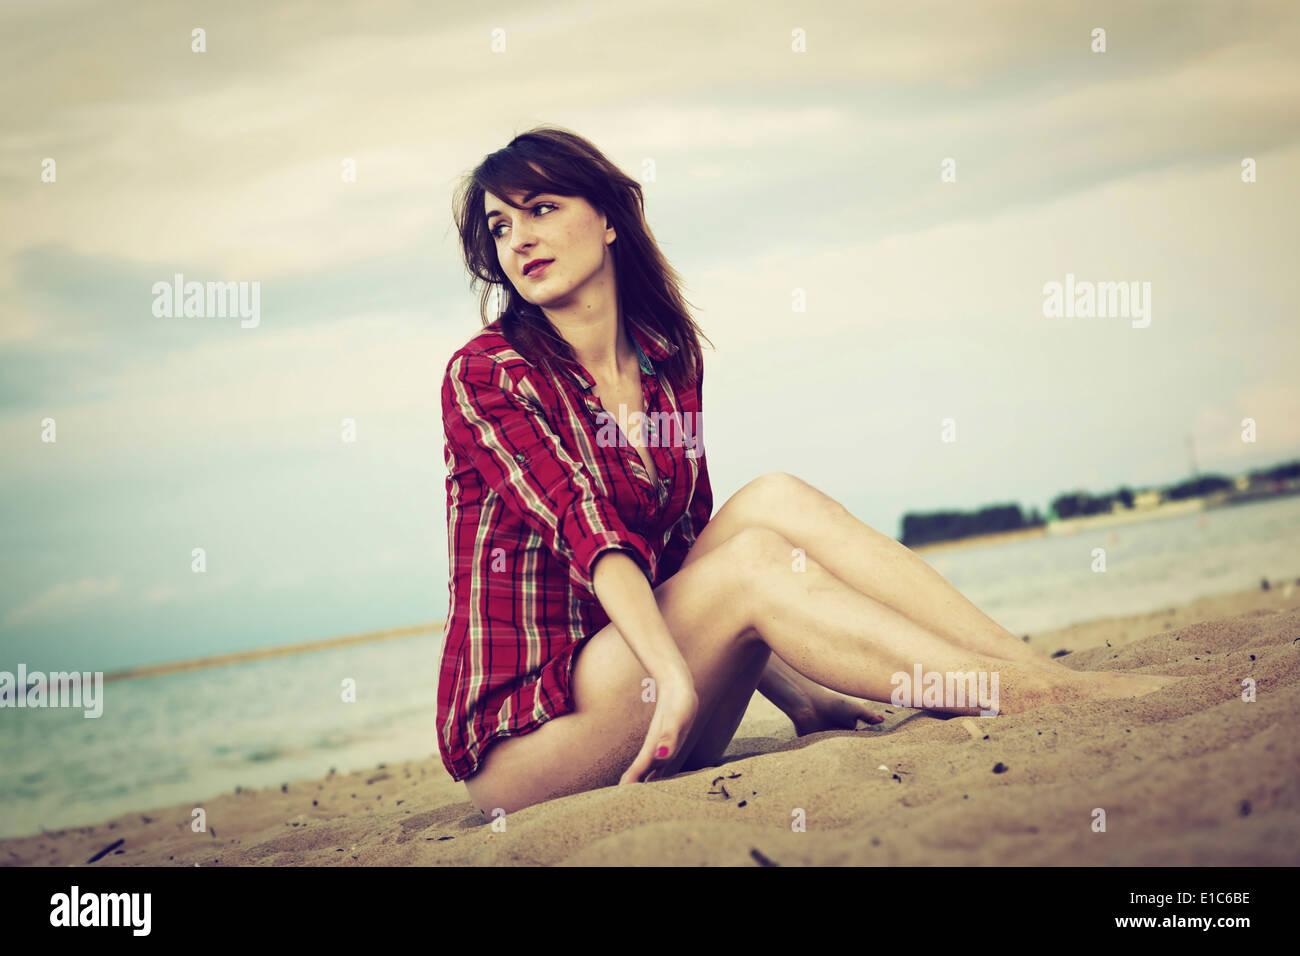 Junge Frau in ein Rot kariertes Hemd entspannend am Strand bei Sonnenuntergang Stockbild